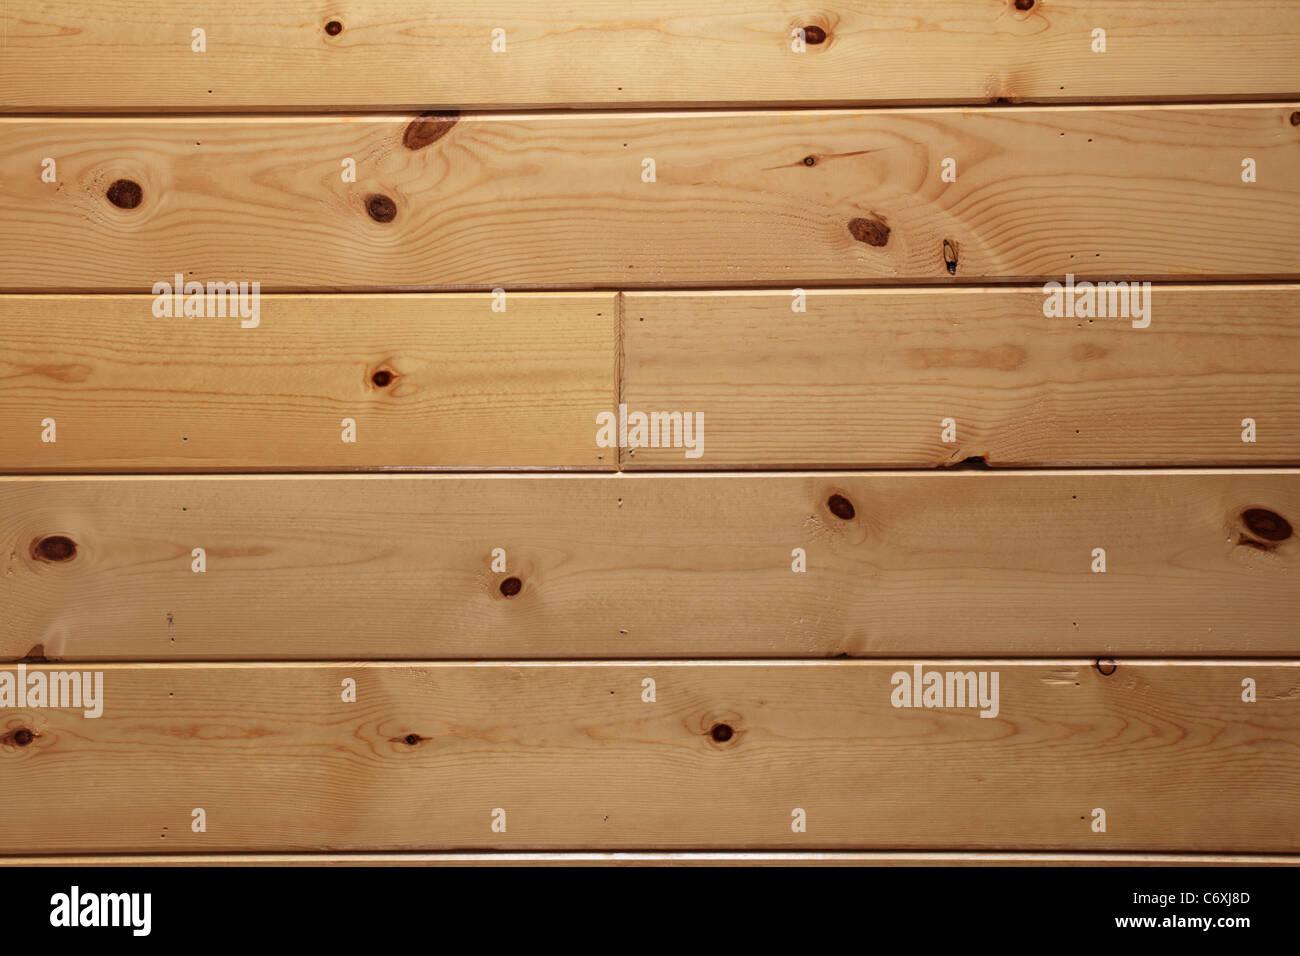 Nudoso panelado de madera barnizada textura de fondo Imagen De Stock